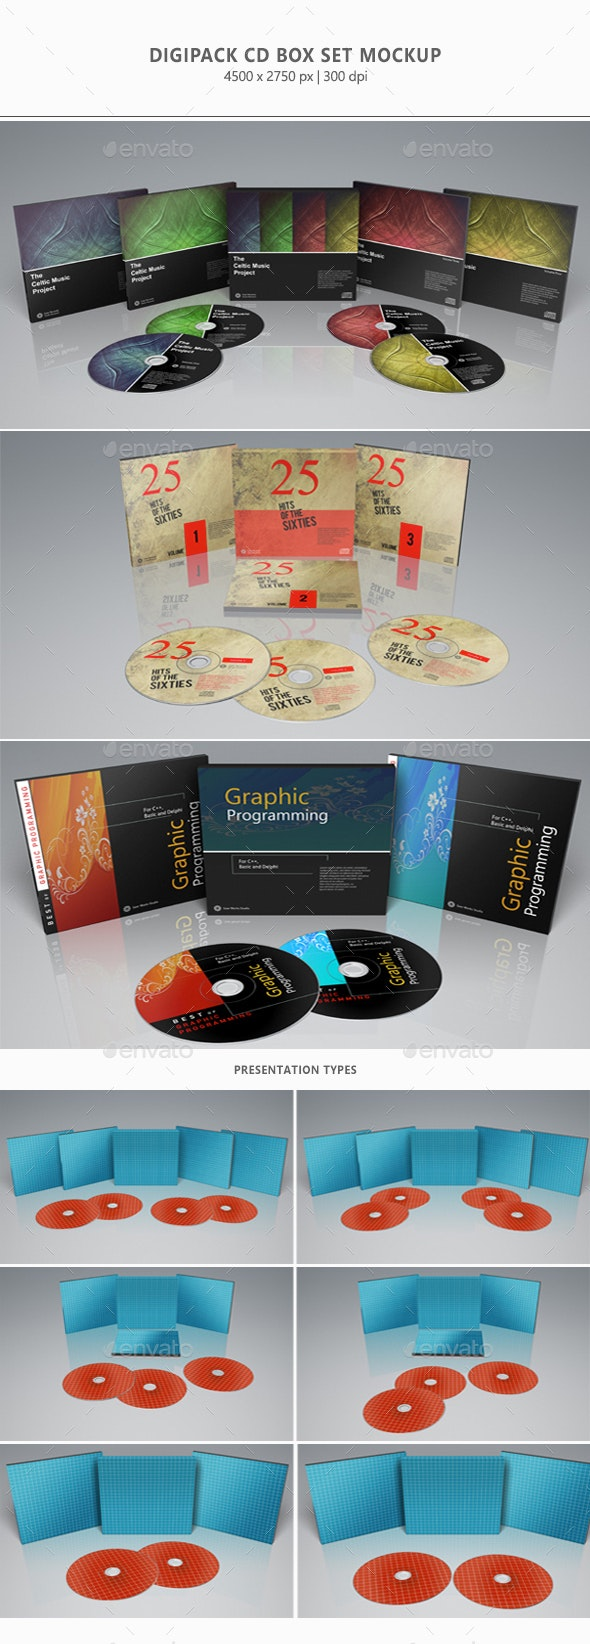 Digipak CD Box Set Mock-Up - Discs Packaging